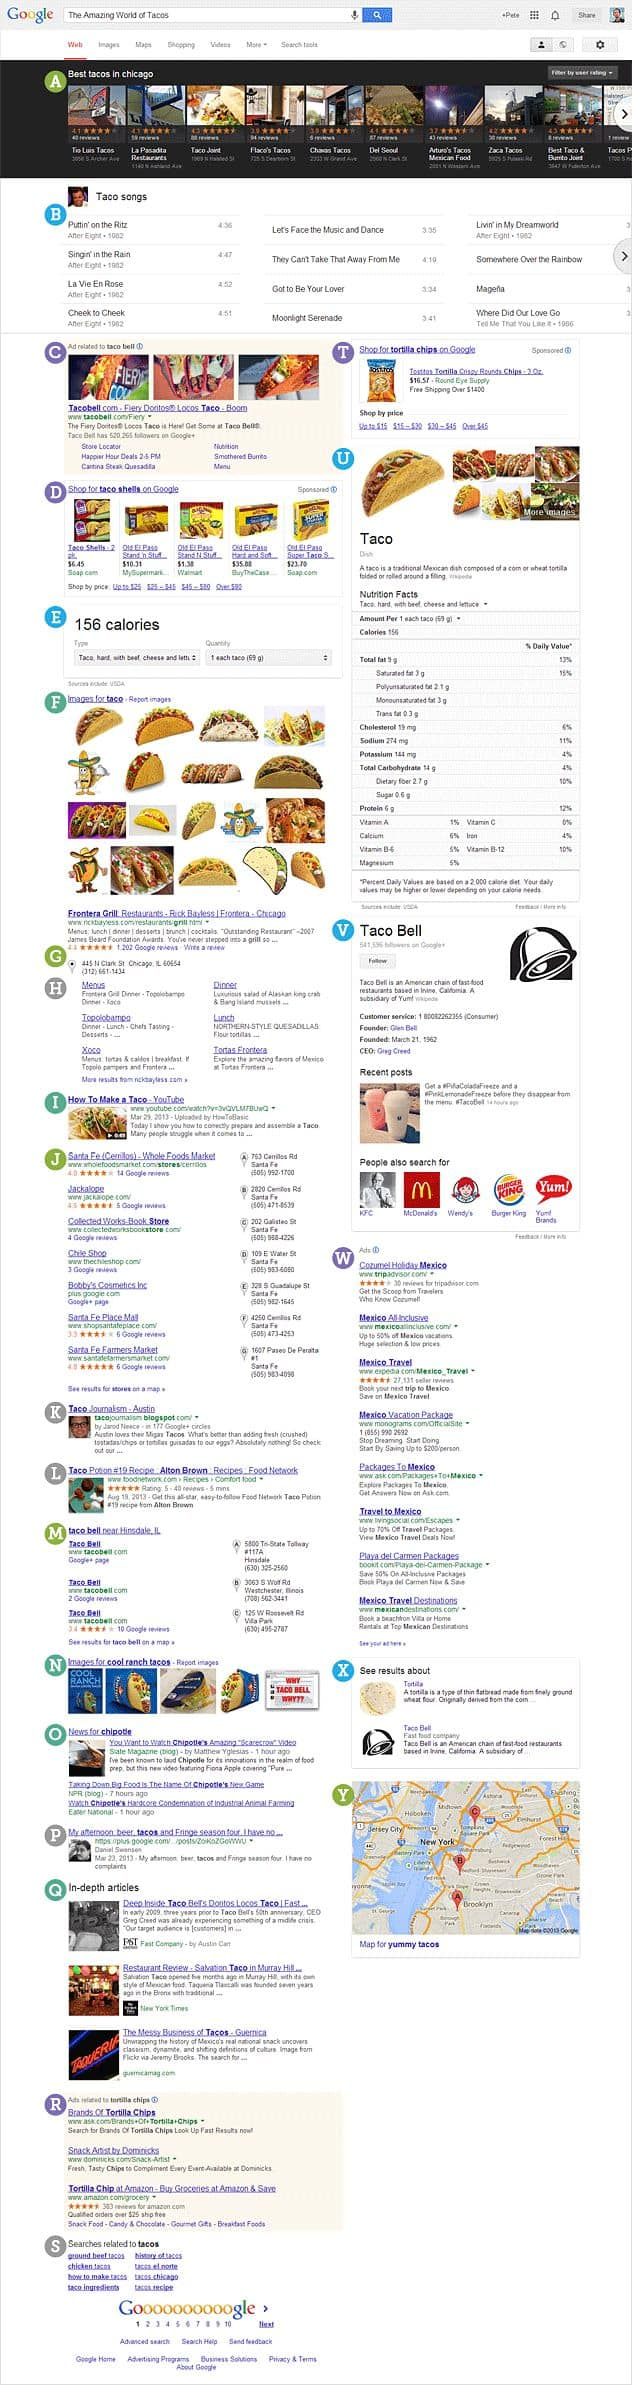 Mega SERP Google